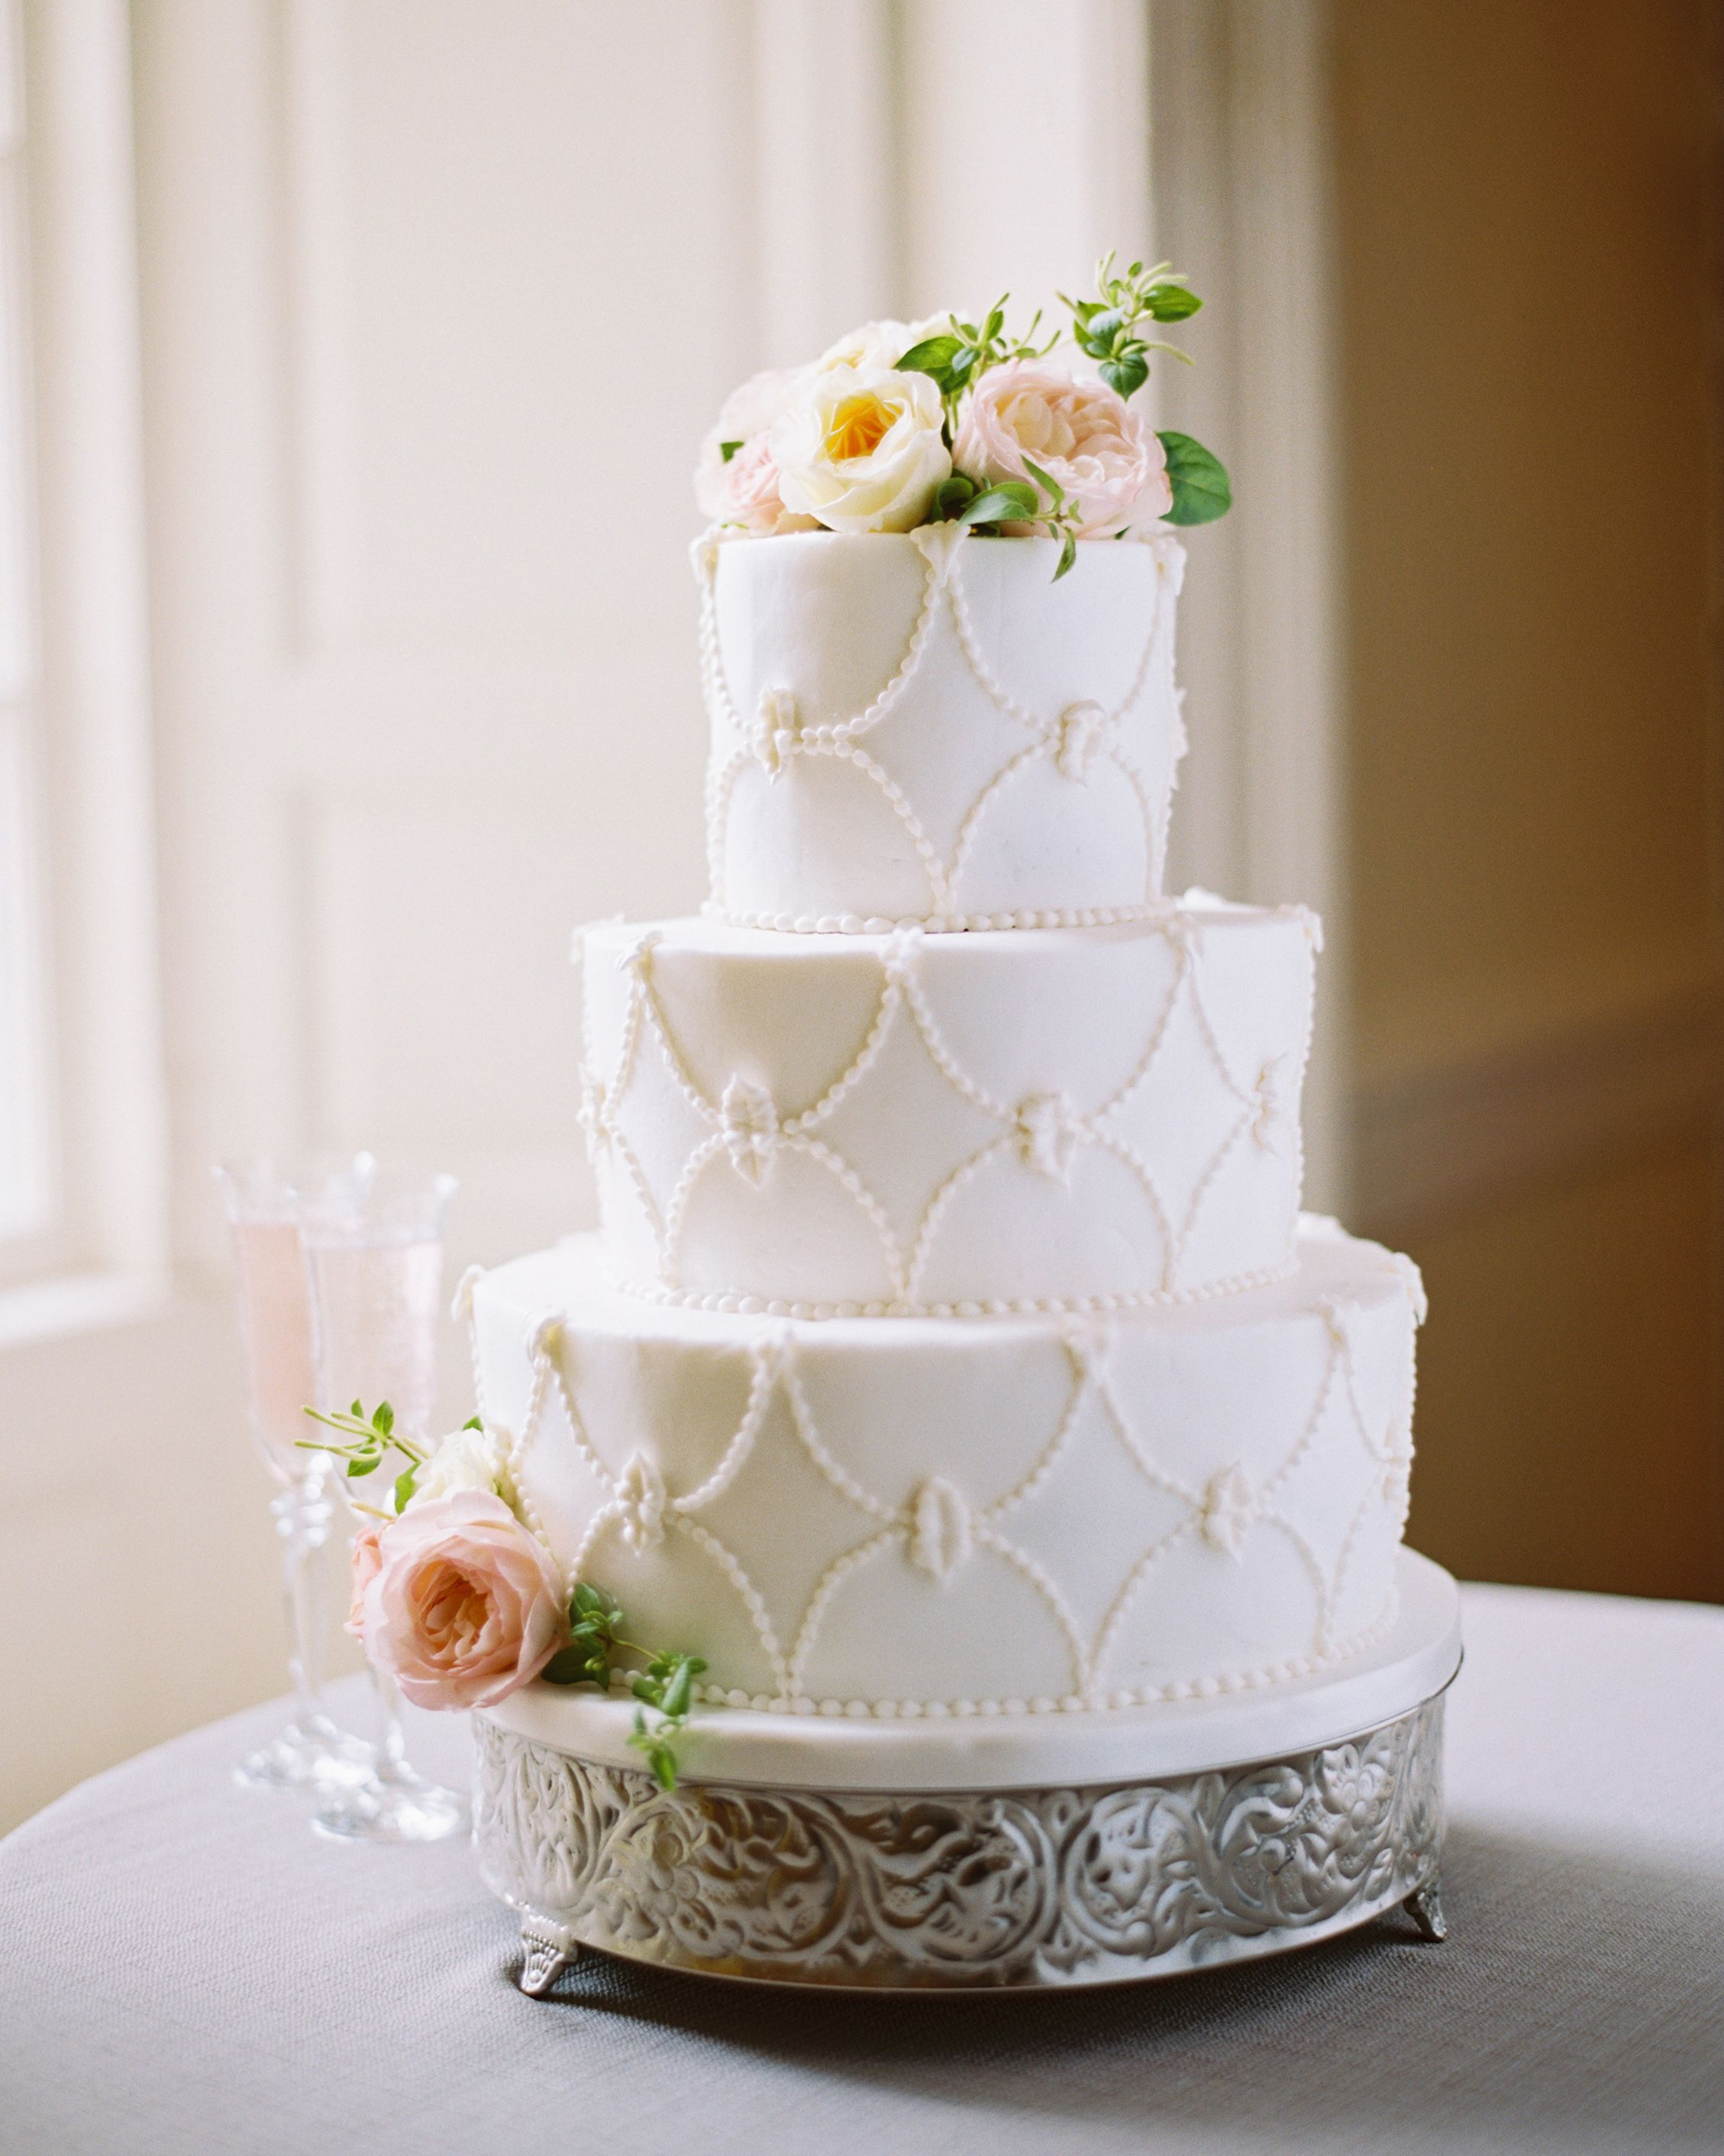 33 Romantic Wedding Cakes Spring Wedding Cake Romantic Wedding Cake Cool Wedding Cakes